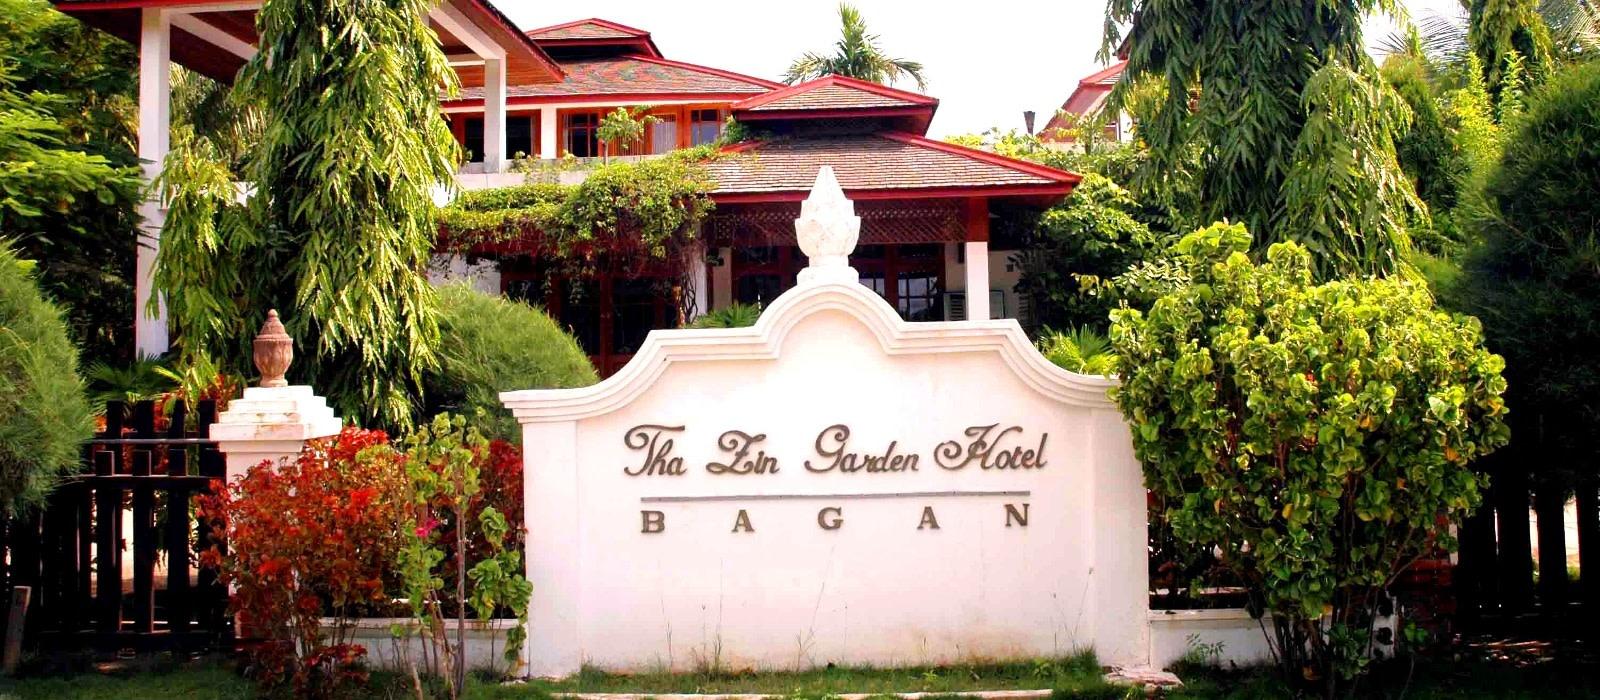 Hotel Thazin Garden (Bagan) Myanmar